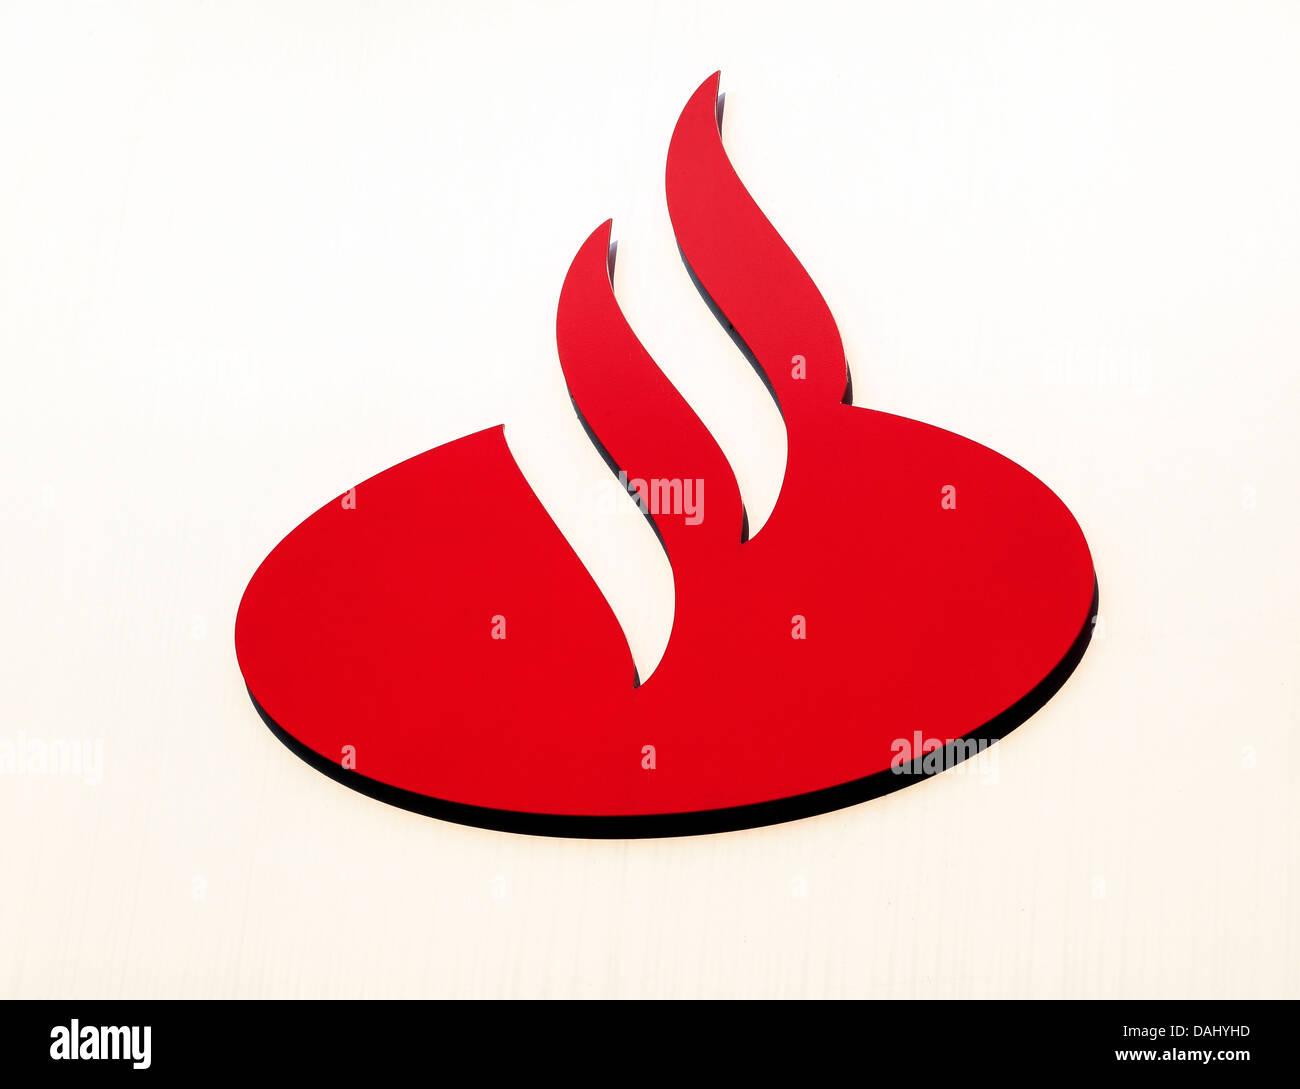 Santander logo, bank banks - Stock Image